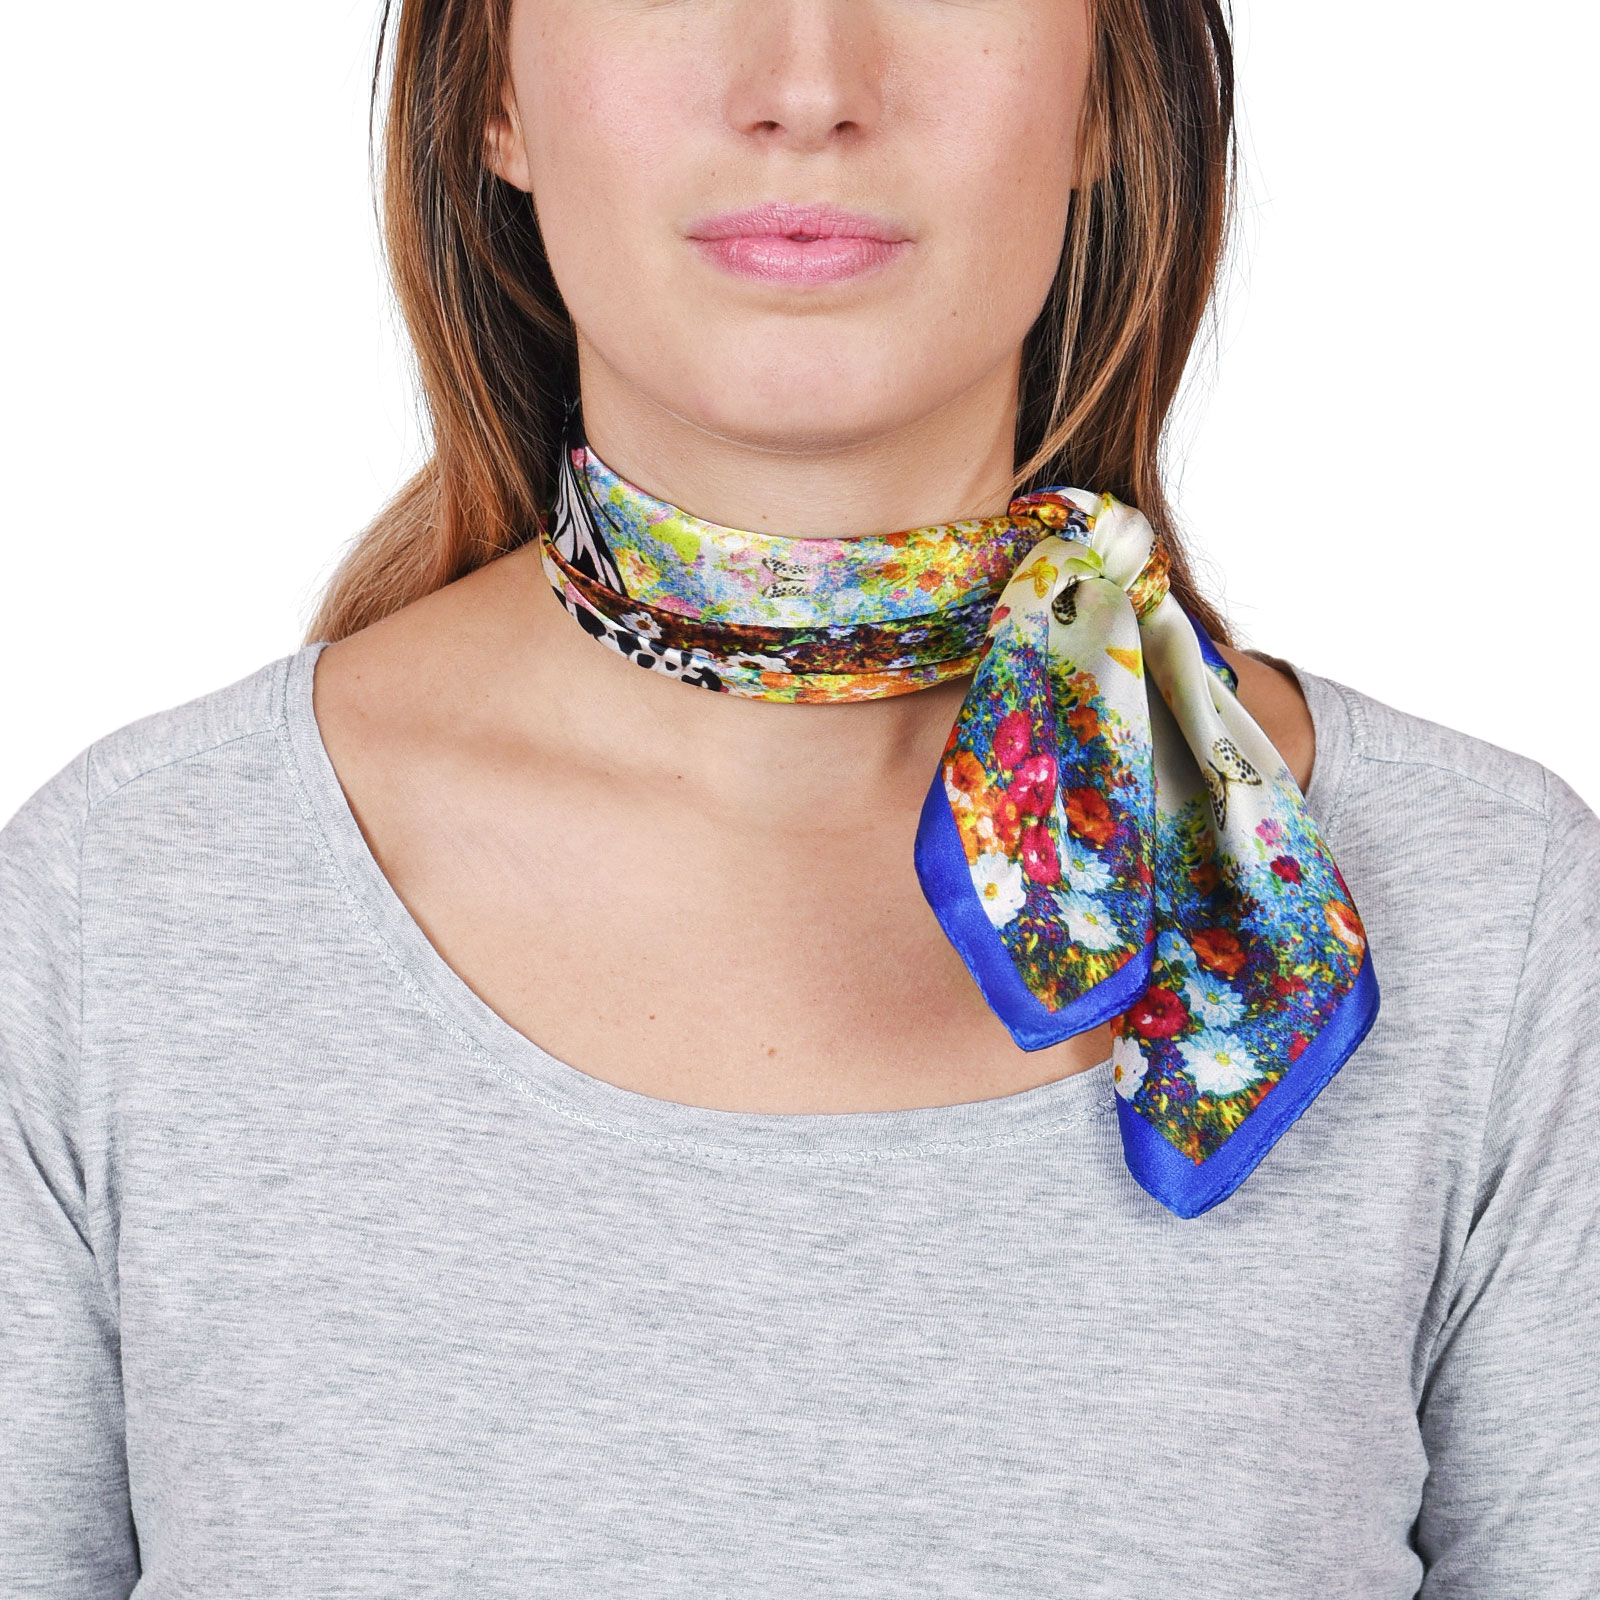 AT-04654-VF16-foulard-carre-soie-bleu-marine-papillons-et-fleurs